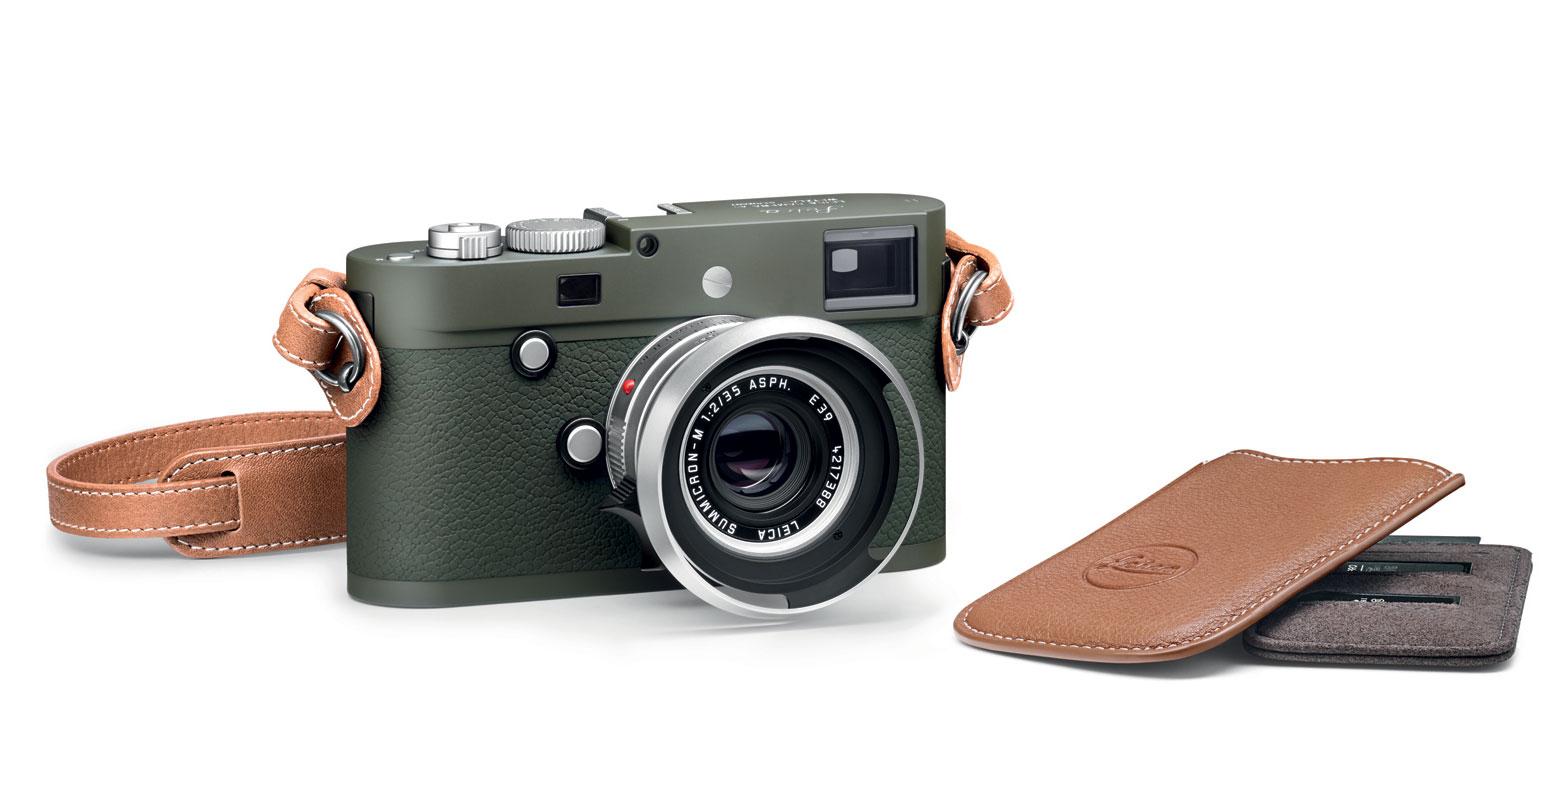 Leica Camera Launch Limited-edition, Olive Green 'Safari' Camera 4